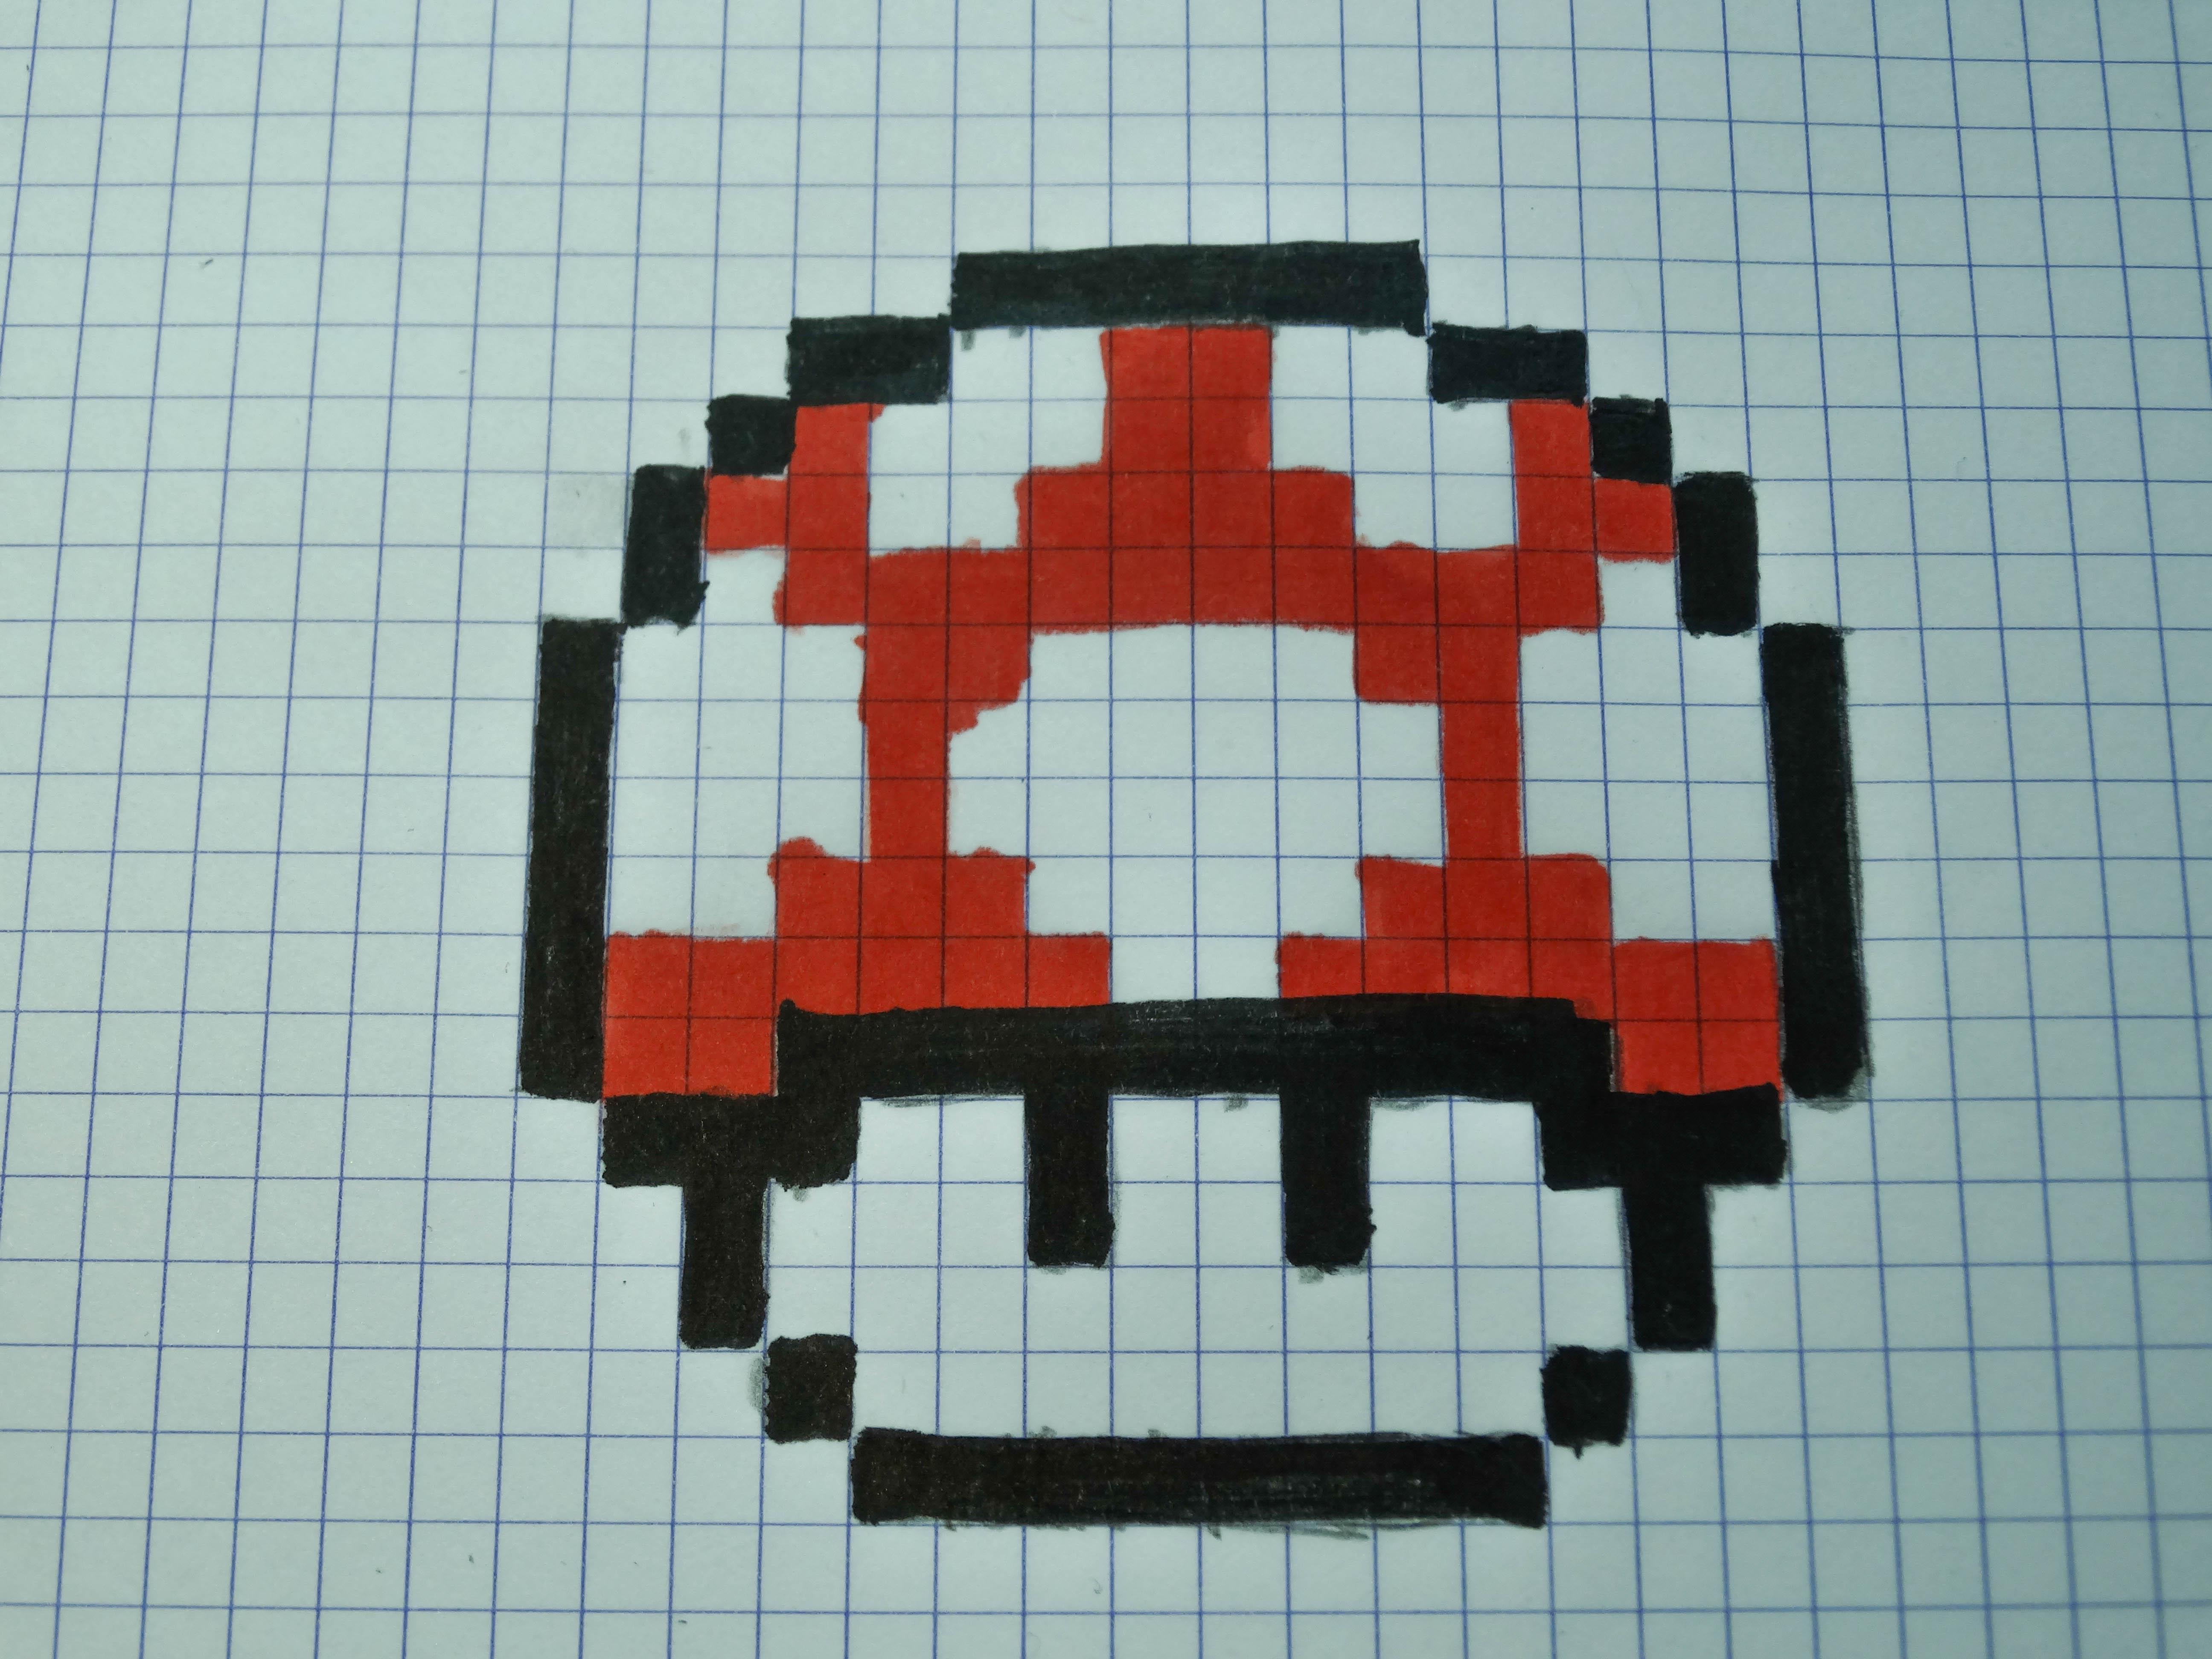 Pixel Art Nourriture Kawaii Facile